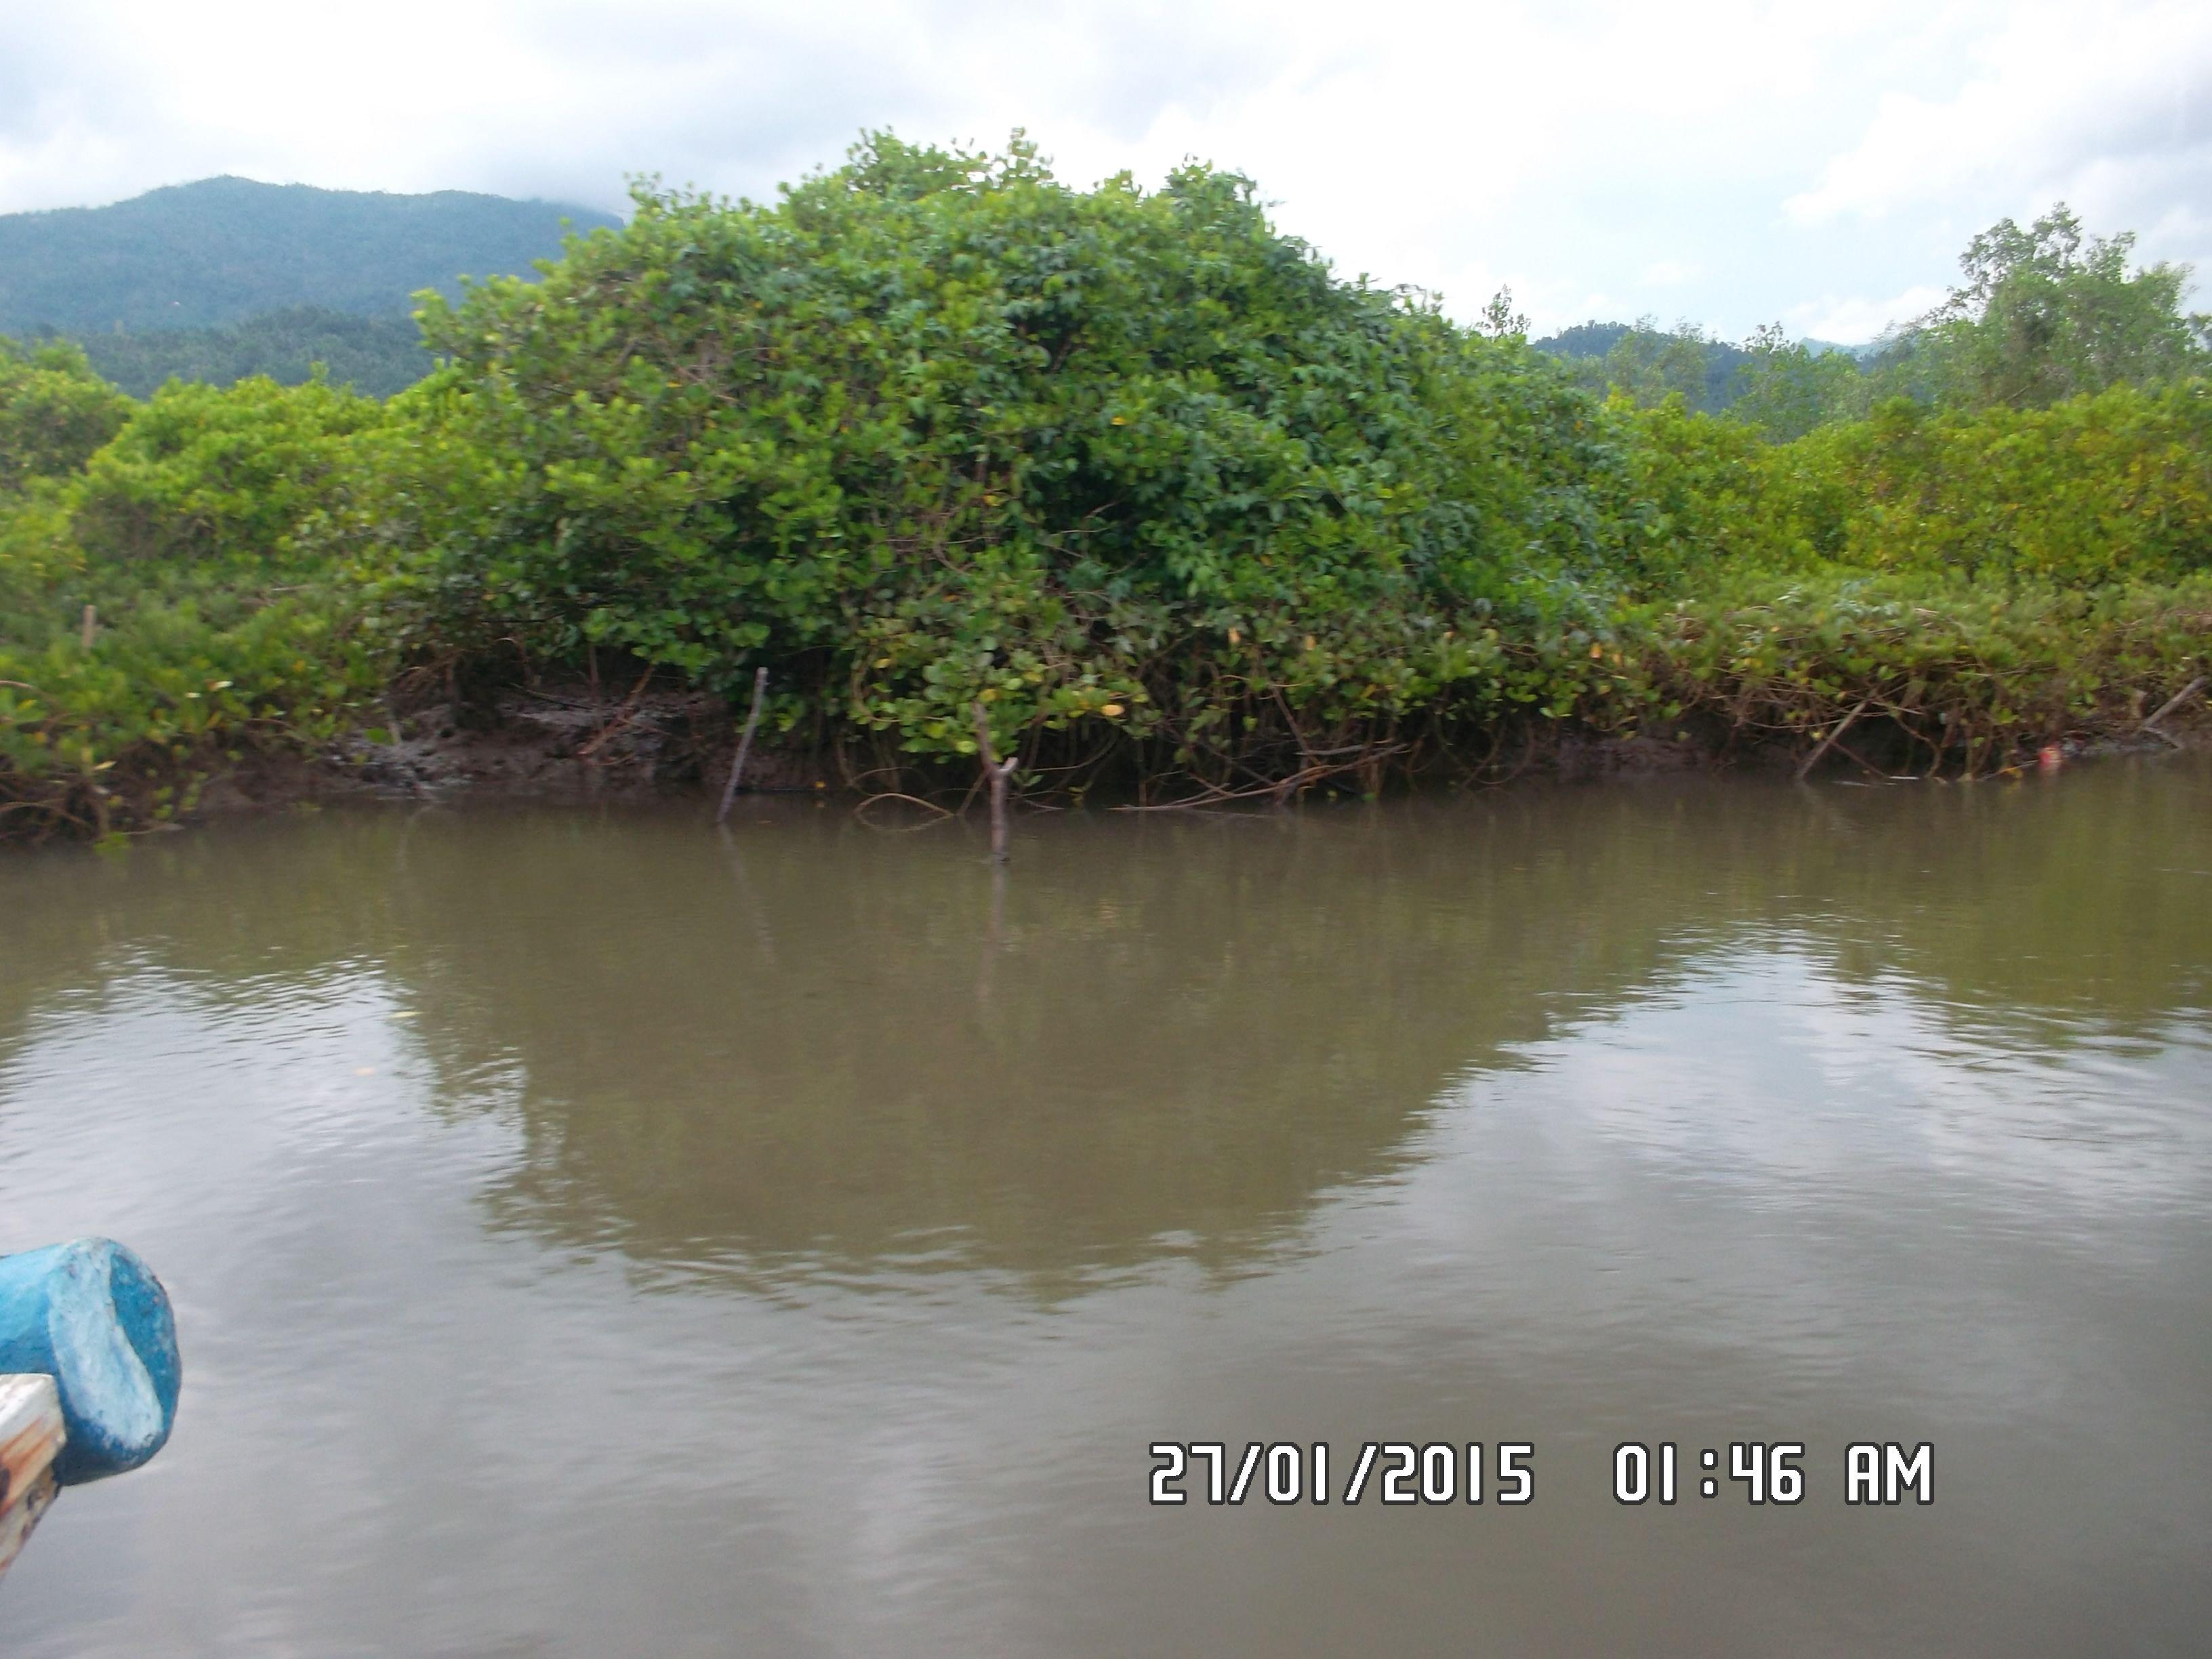 Taman Wisata Mangrove Cengkrong Trenggalek Jatim Indonesia Hutan Pancer Kab